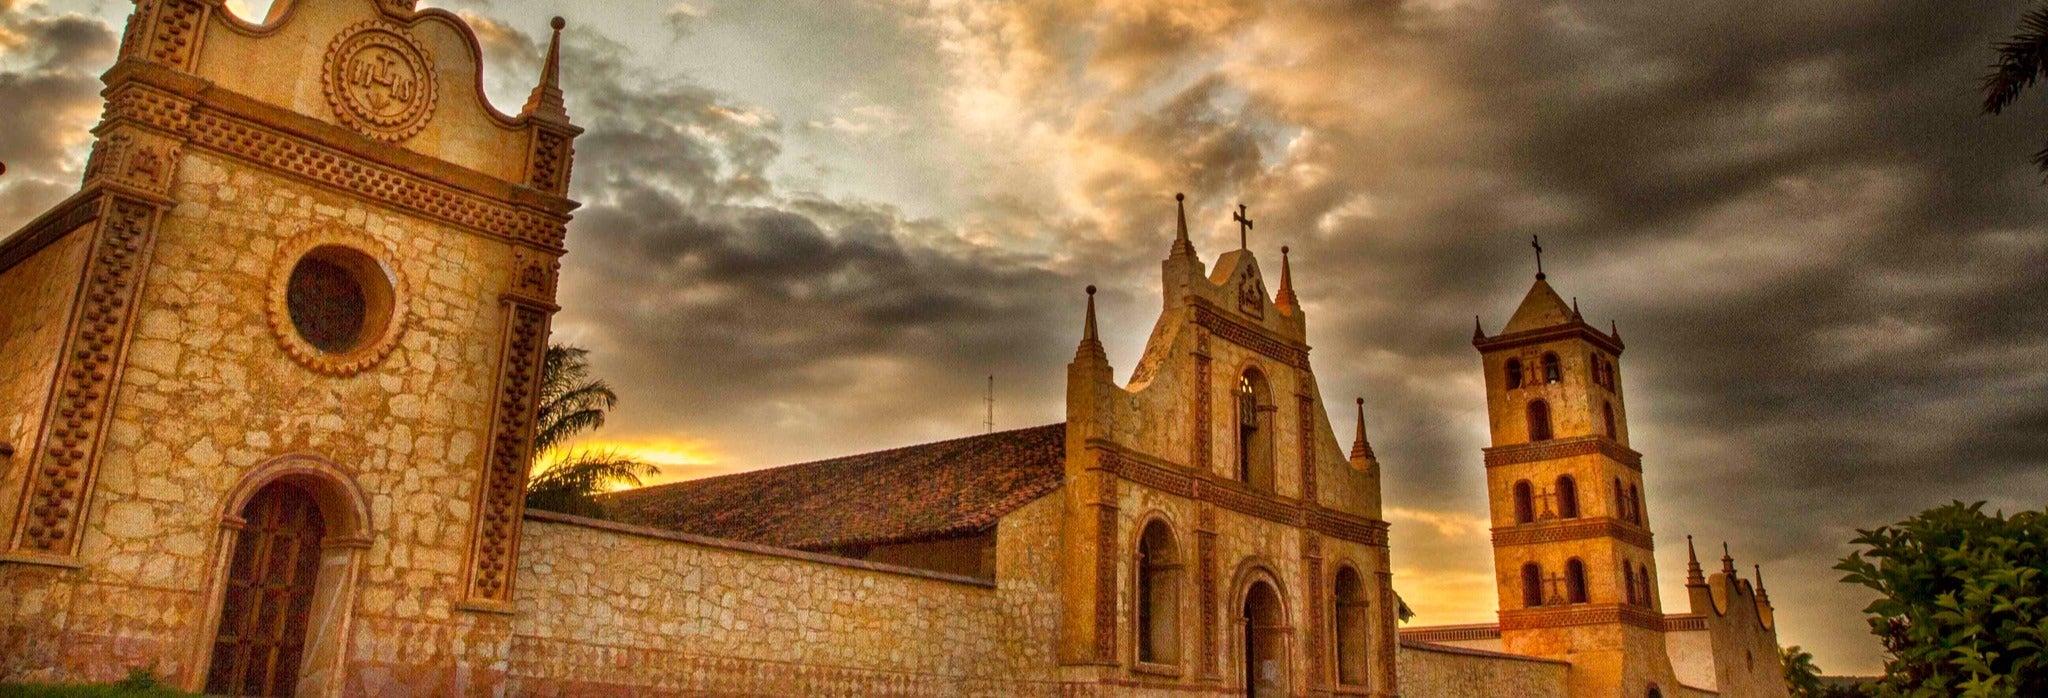 Excursão às Missões Jesuíticas